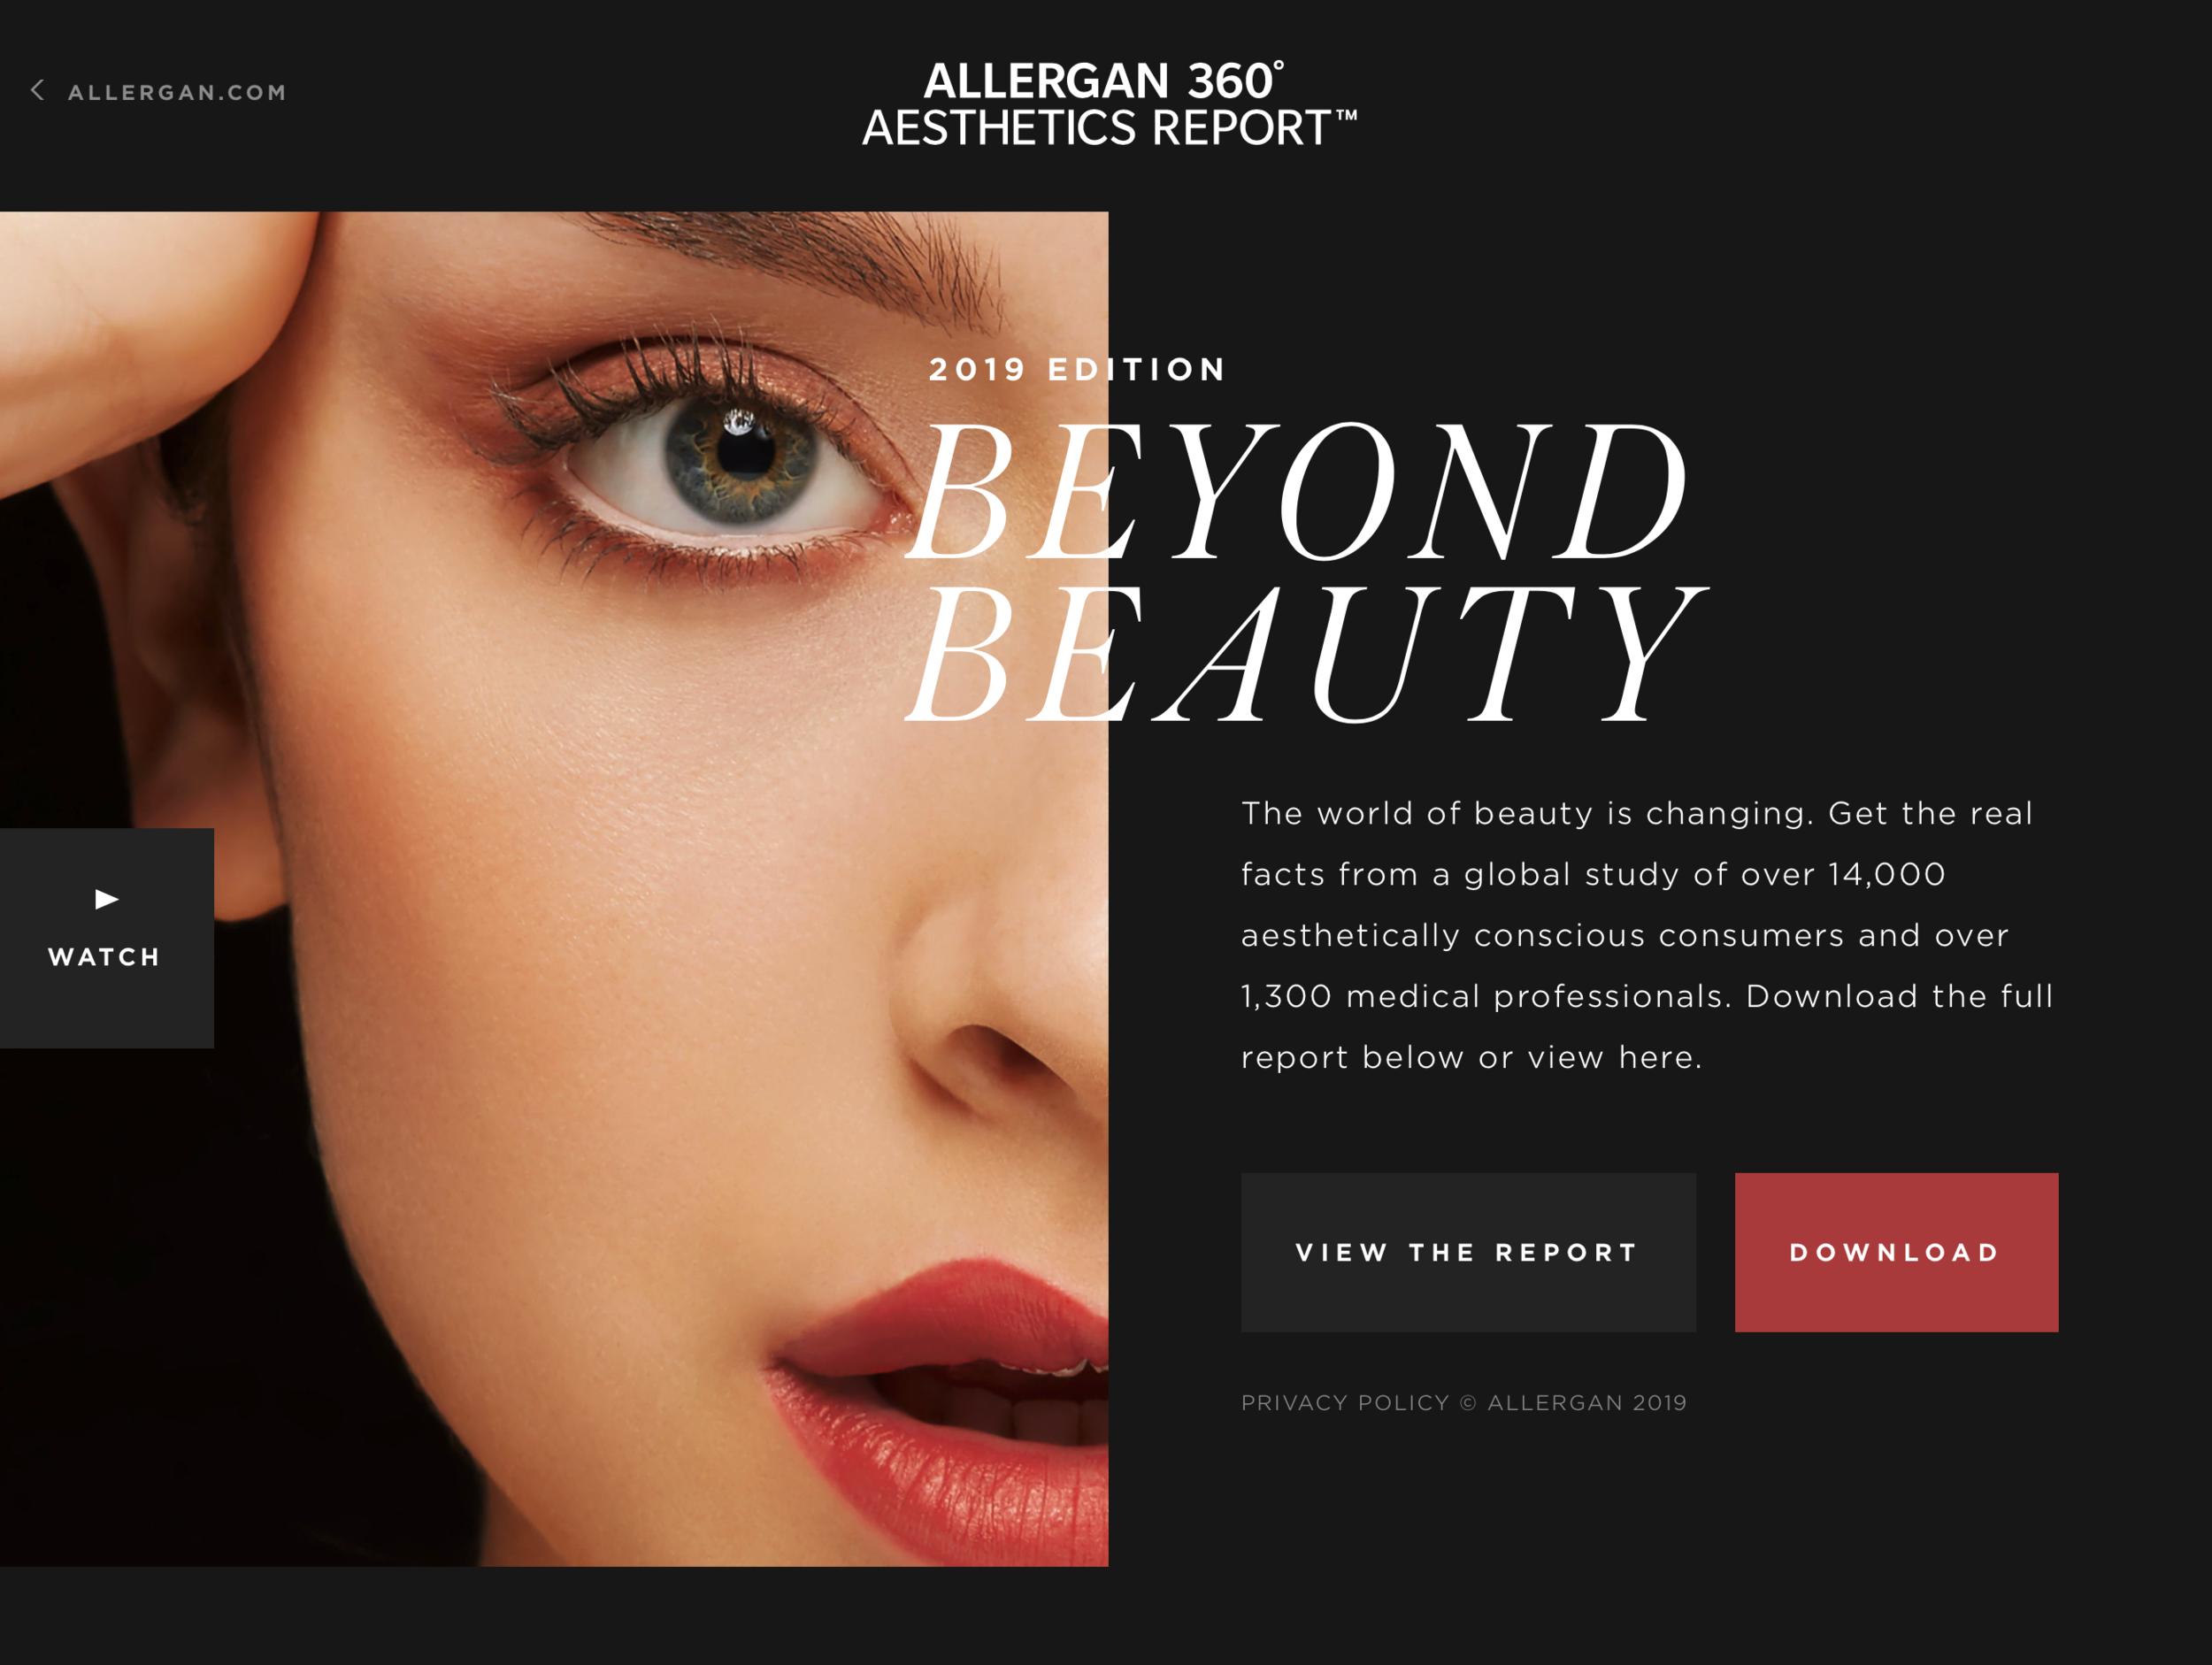 allergan-cosmetic-photographer-beauty-barcelona-leandro-crespi.png